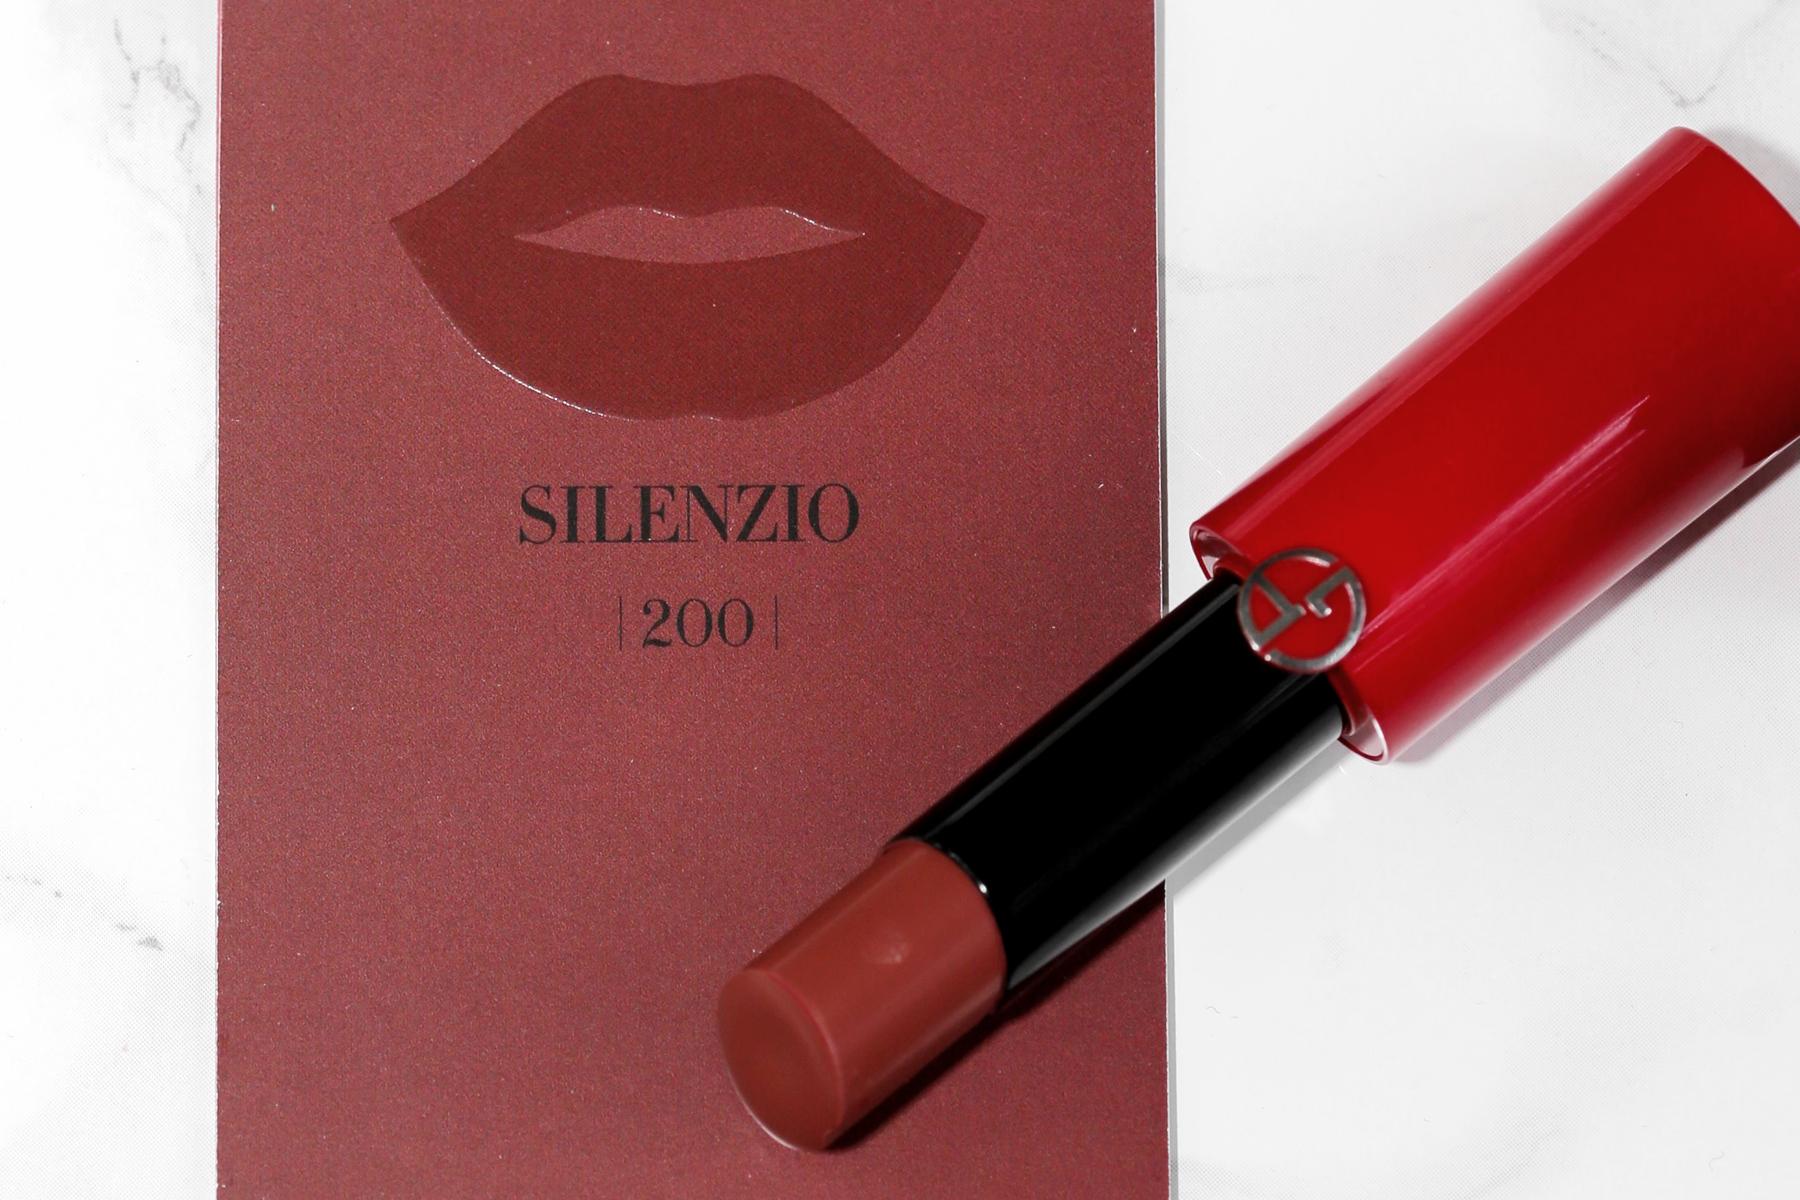 Giorgio Armani Ecstasy Shine review_9646.jpg